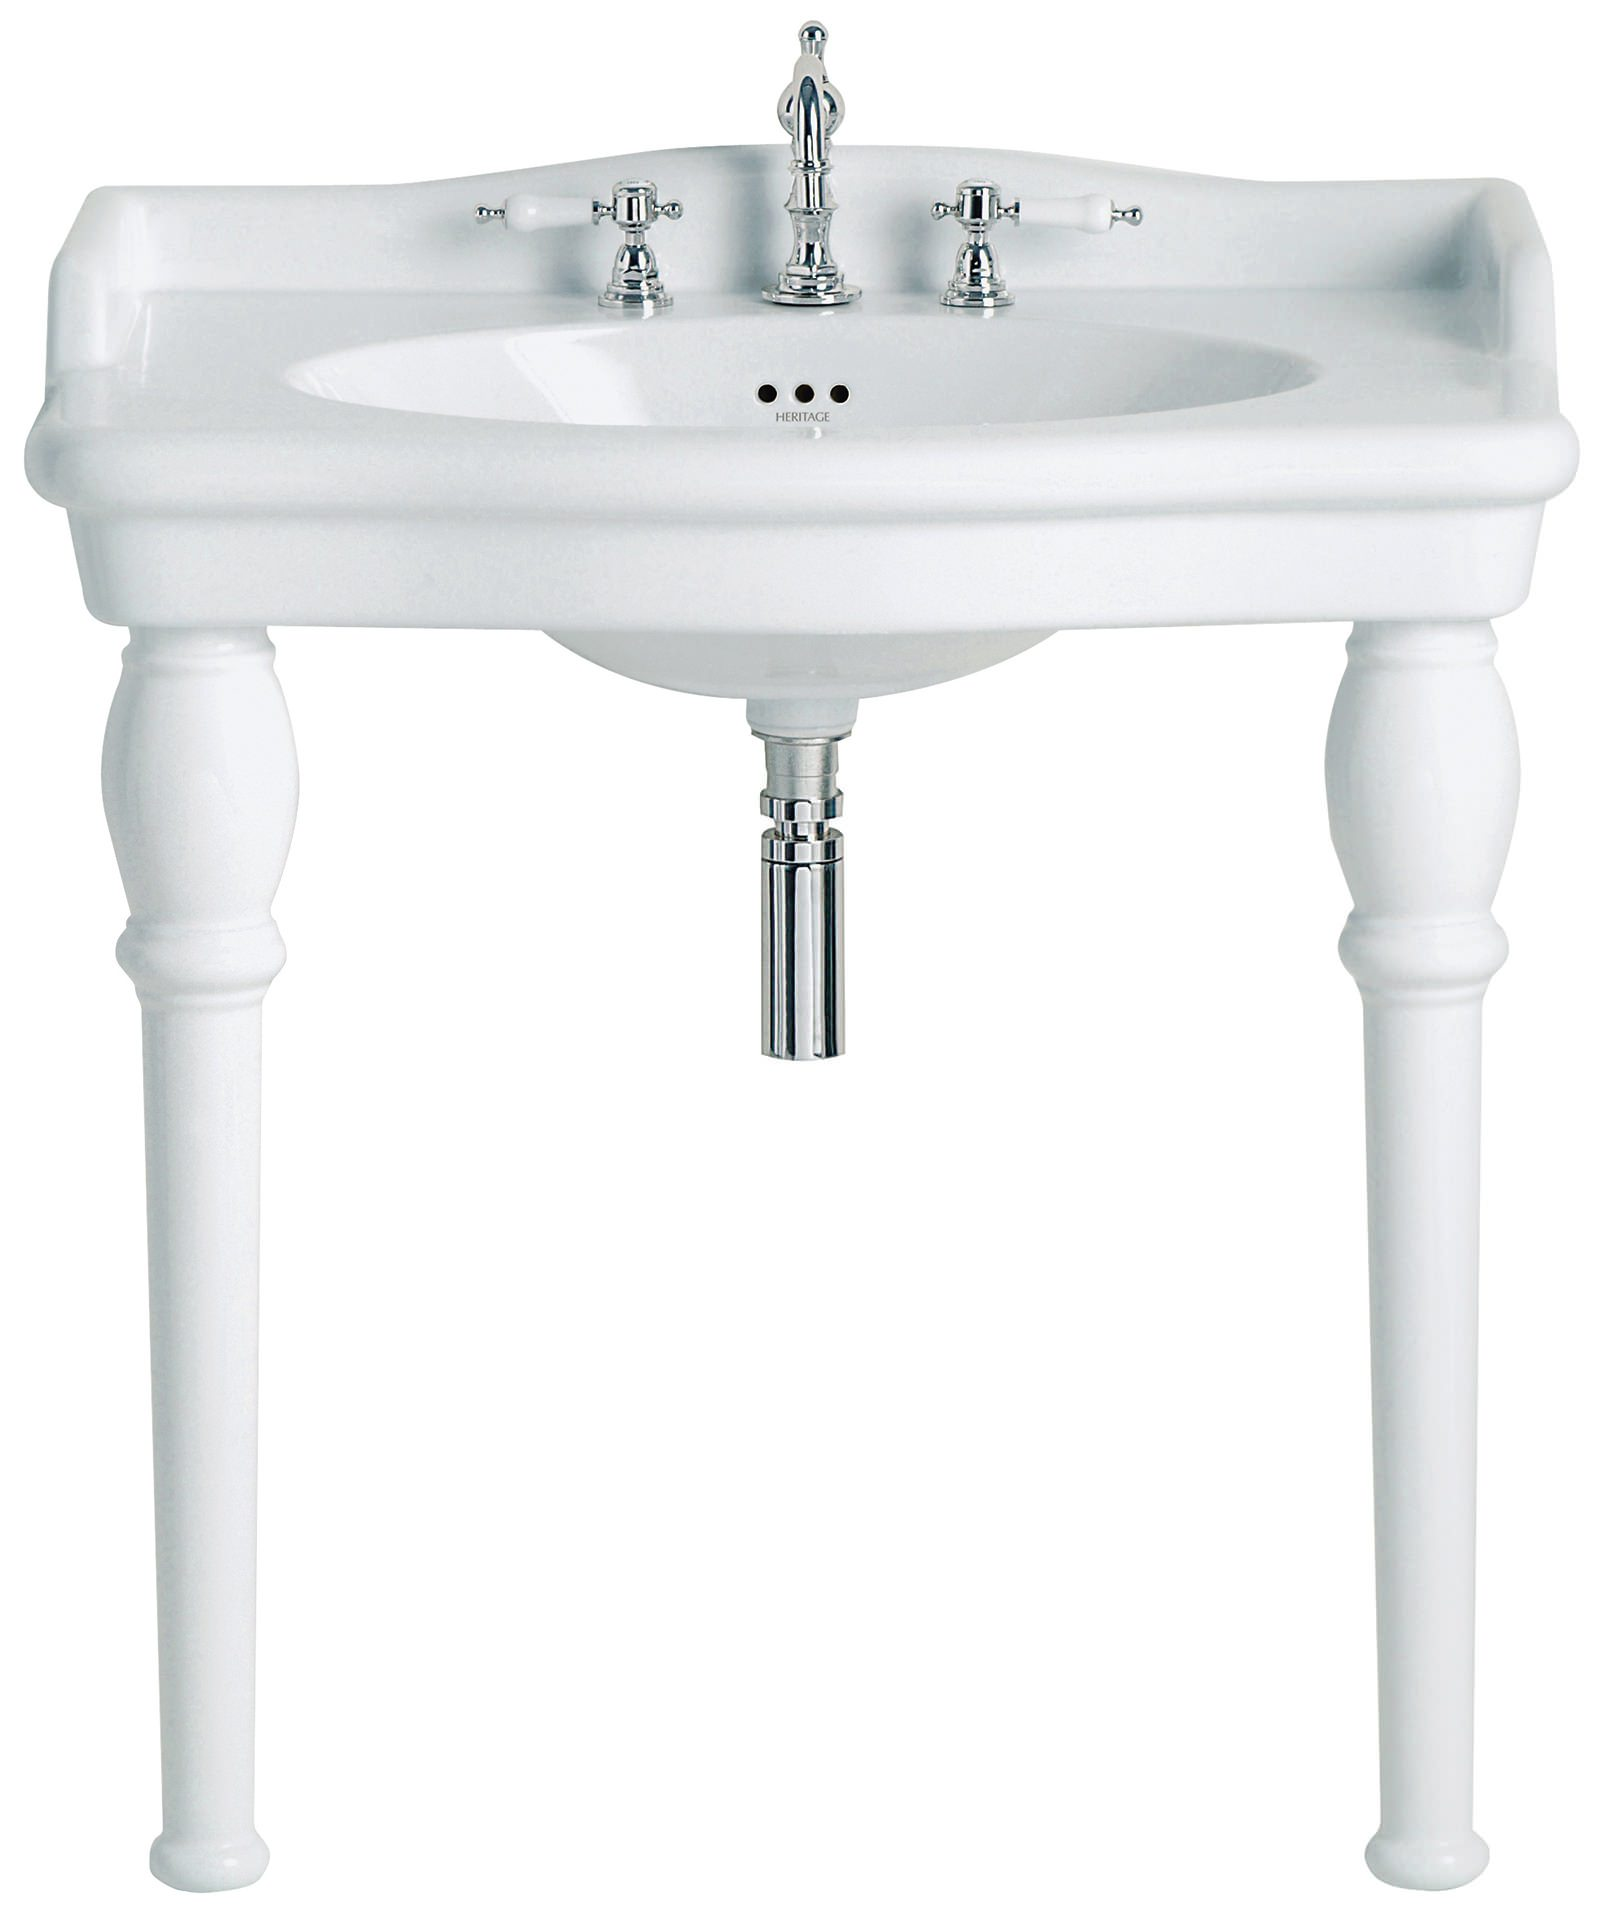 Traditional bathroom sink - Alternate Image Of Heritage Victoria Traditional Bathroom Suite 2